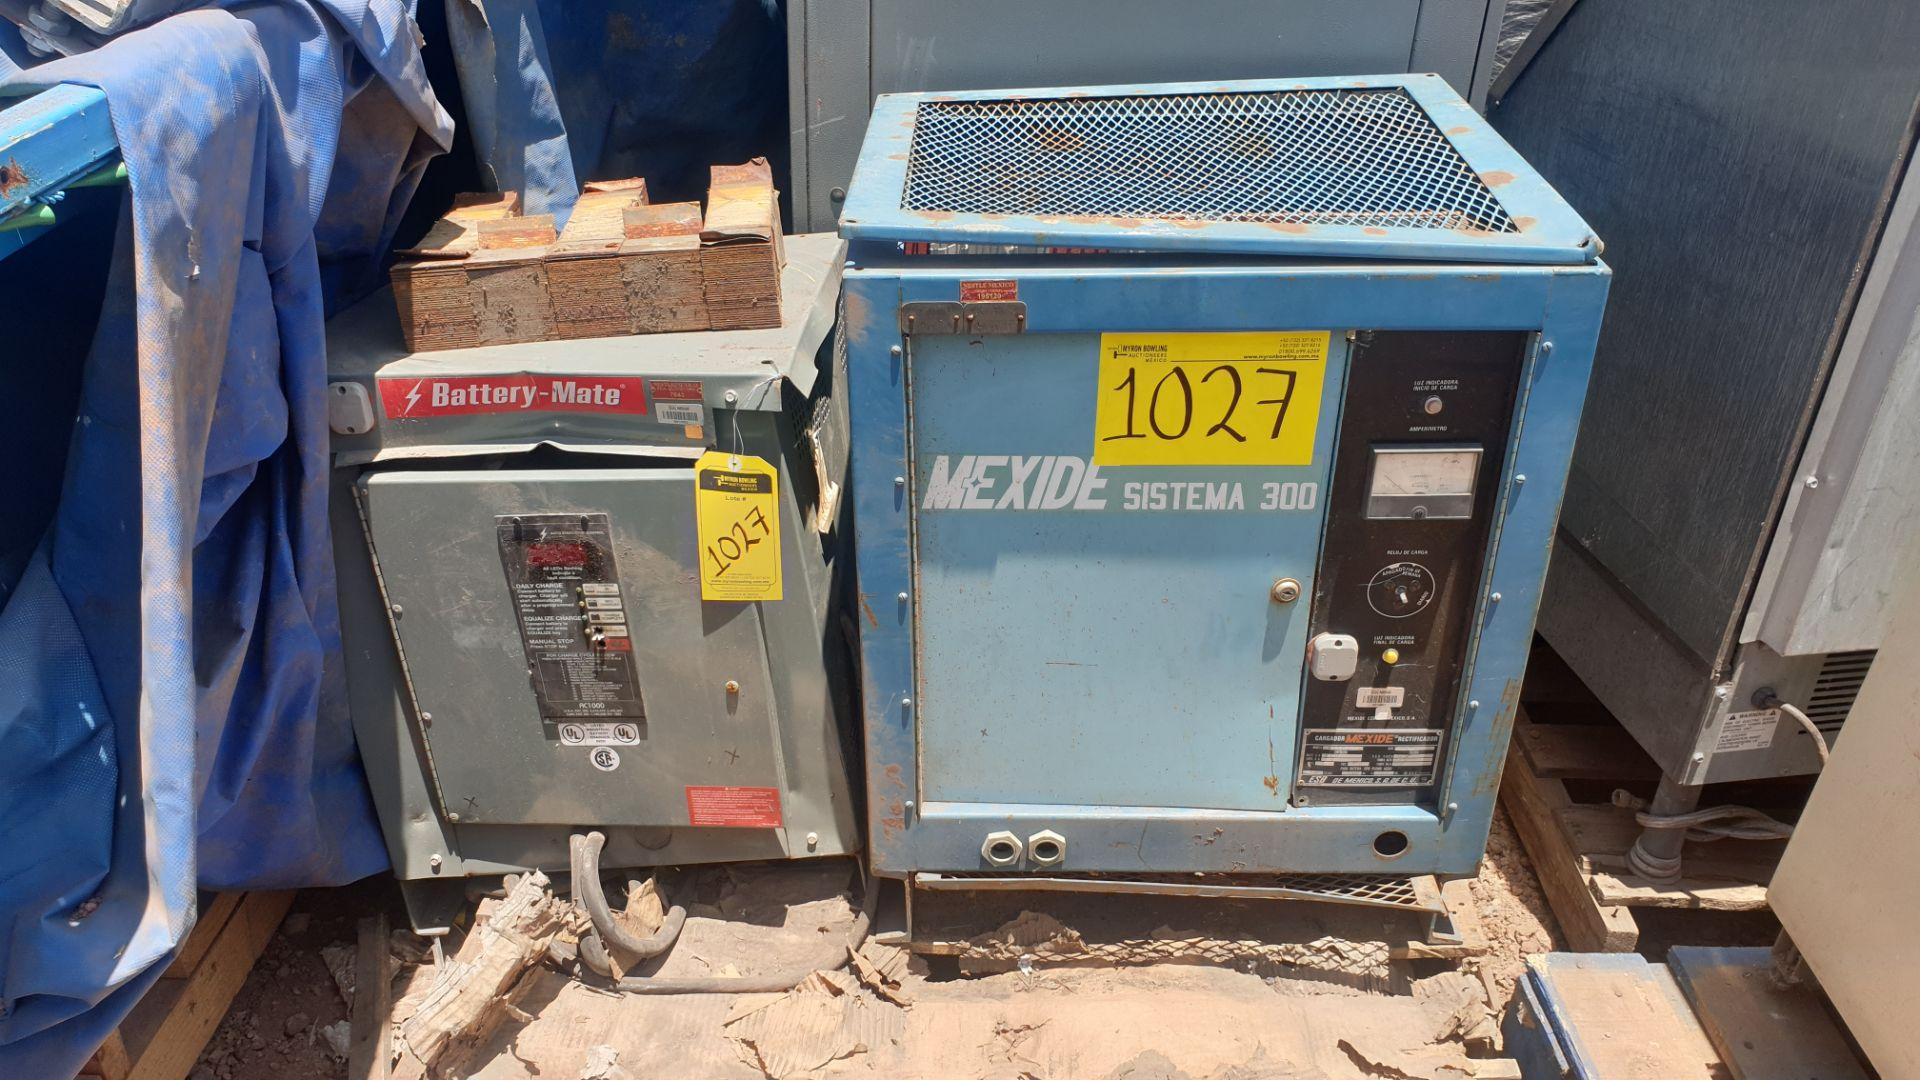 1 Battery-Mate charger, model 1050H3-18C 208/240/480V, 1 Mexide charger model CAS18.3.700